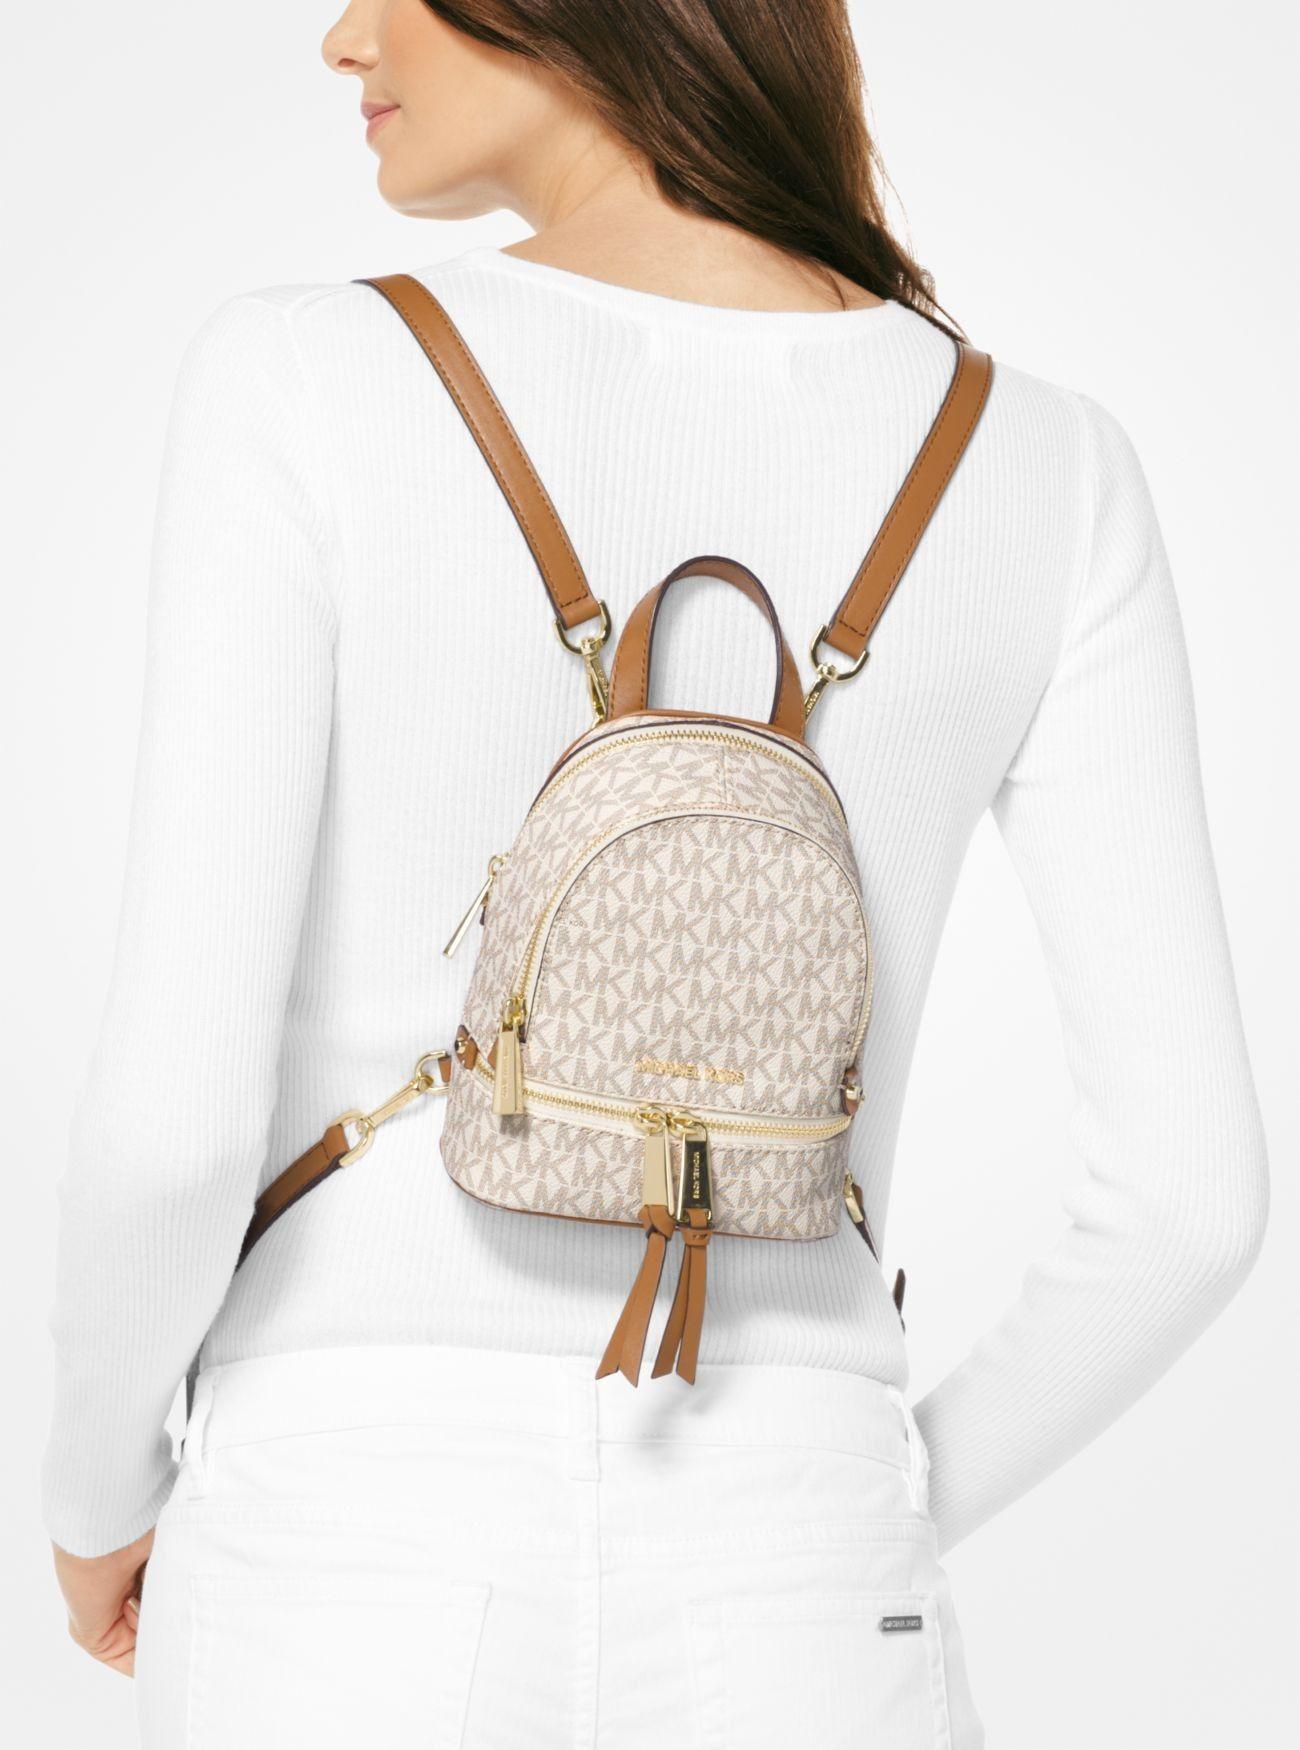 e2f13662c563 Sale Michael Kors Vanilla Rhea Mini Logo Backpack Online   MK in 2019